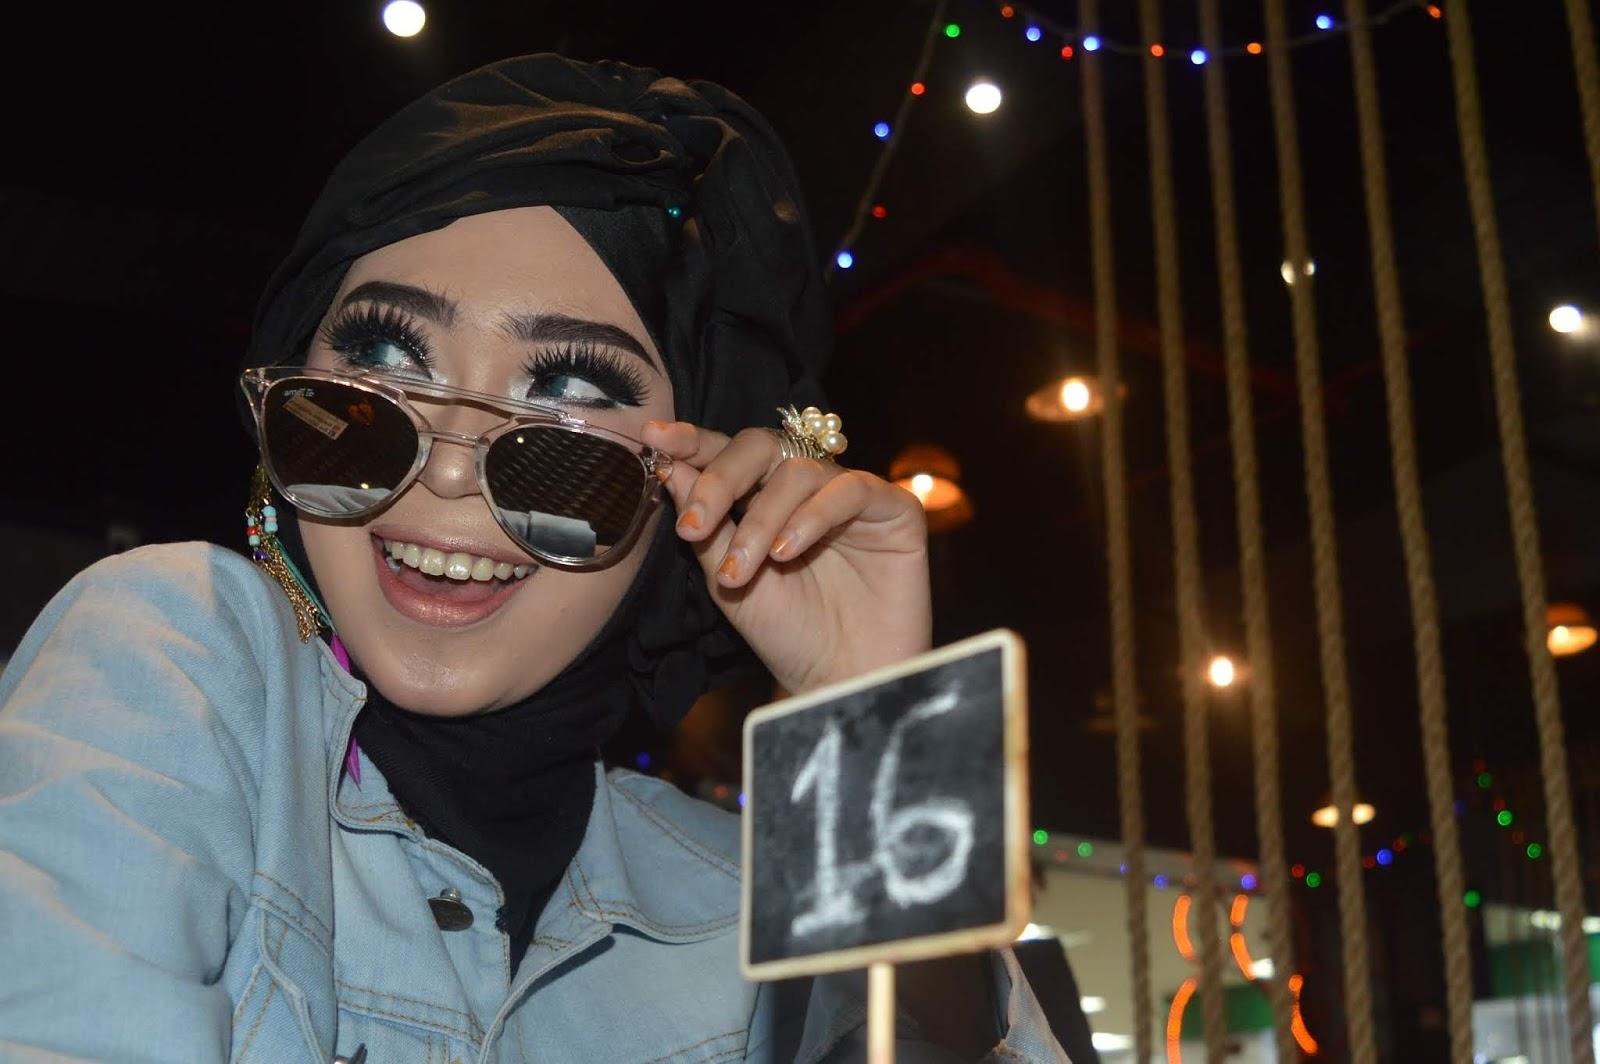 Tutorial Jilbab Pashimina Jadi Lima Hal yang Kreatif Selain untuk Hijab 2